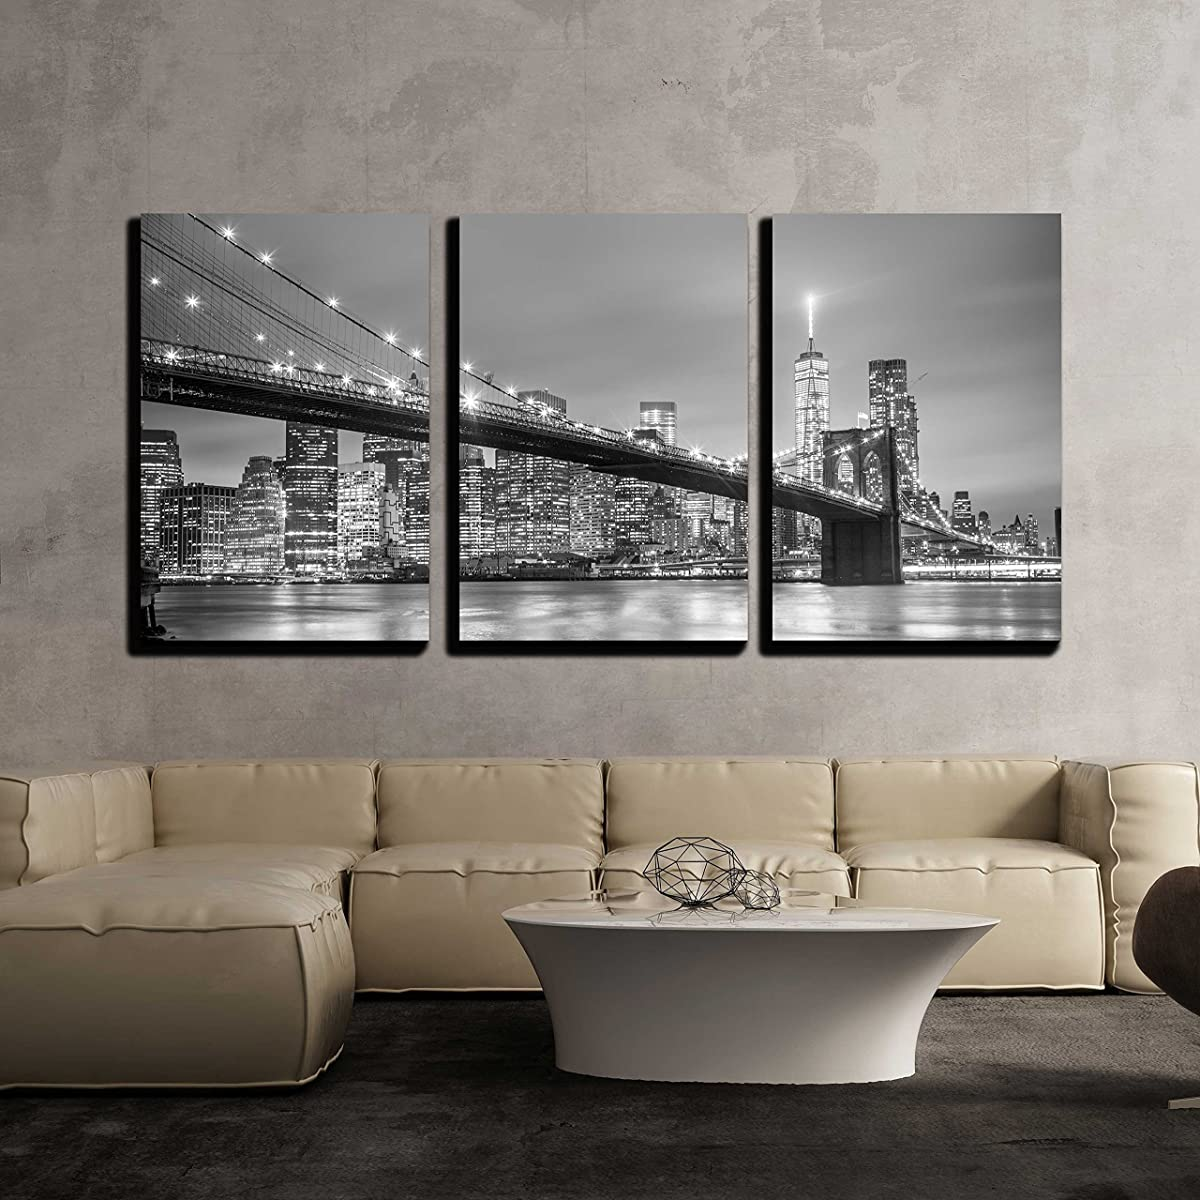 wall26 - York City Downtown Skyline - Canvas Art Wall Decor-16 x24 x3 Panels